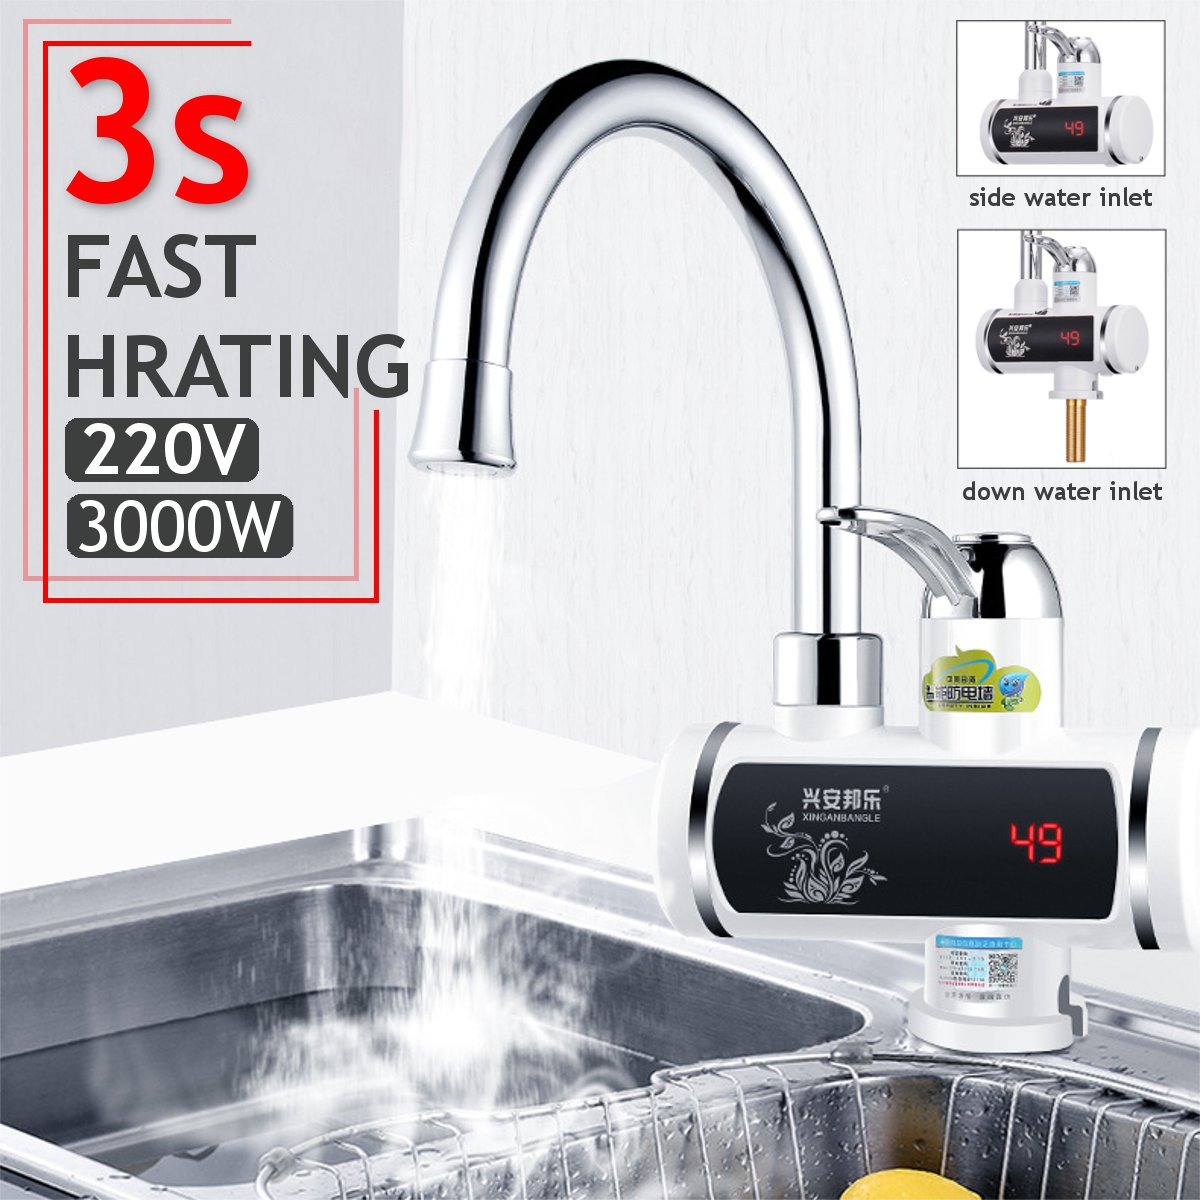 Buy Water Heaters Great Deals On Water Heaters With Free Shipping 11fb Lasochnyckel